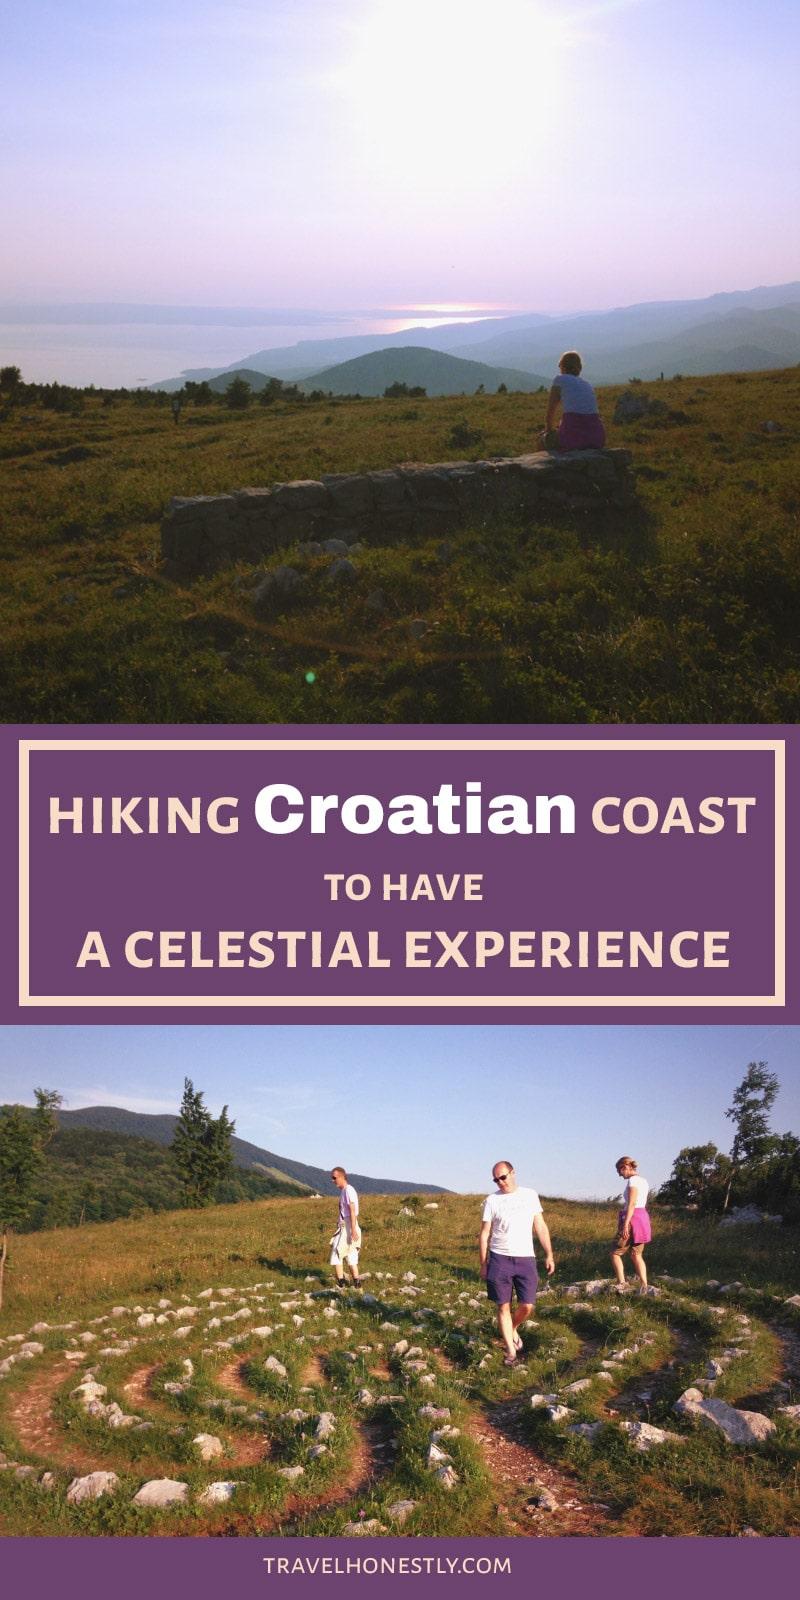 Croatian Coast | Hiking in Croatia | Croatia Travel